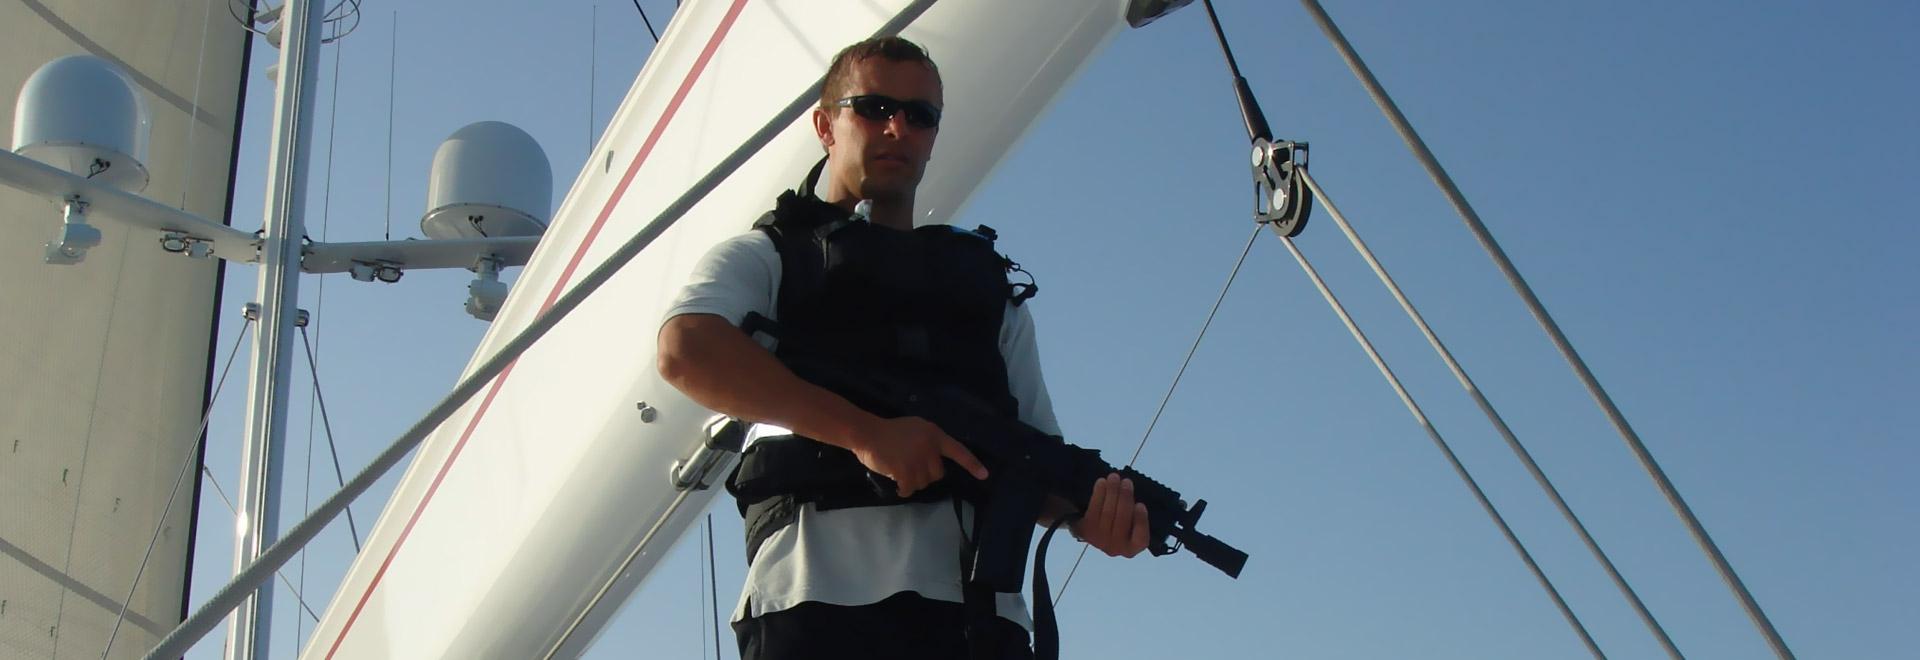 Anti Piracy Security